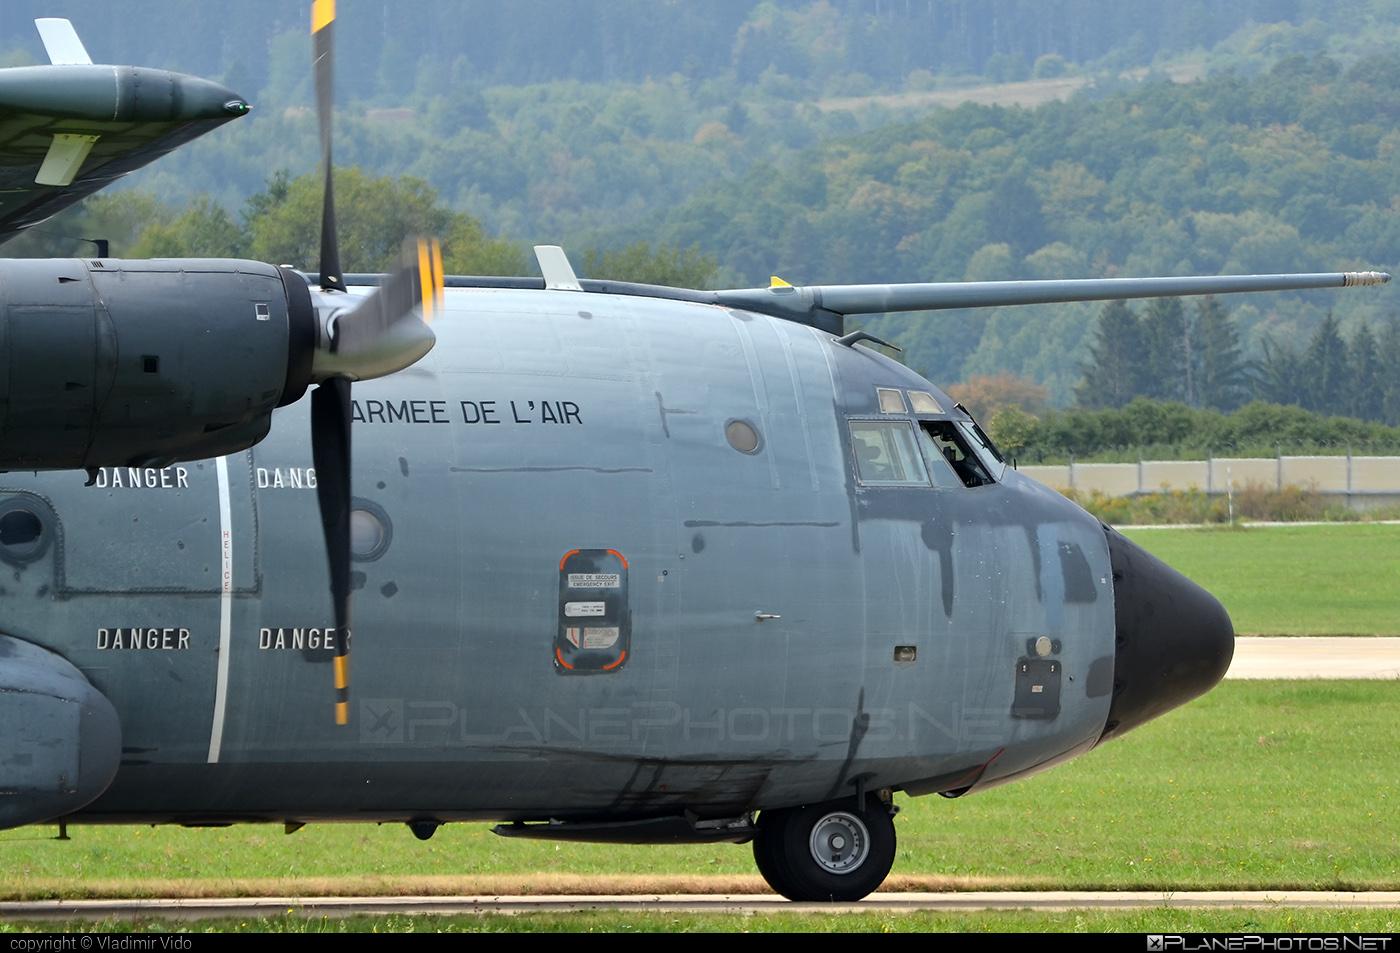 Transall C-160R - R208 operated by Armée de l´Air (French Air Force) #armeedelair #frenchairforce #transall